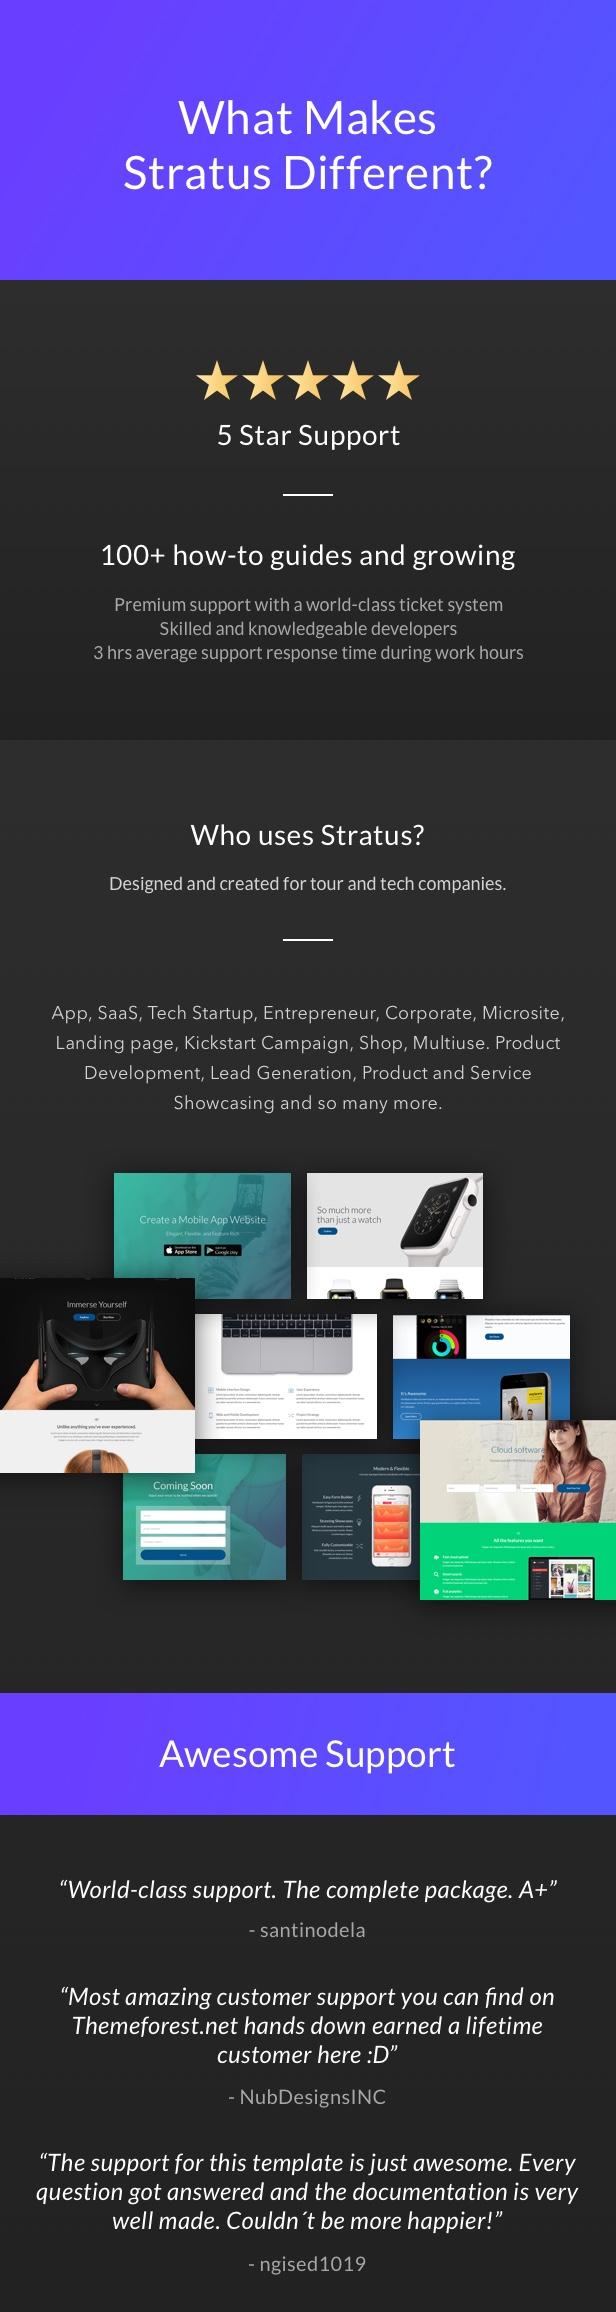 App, SaaS & Software Startup Tech Theme - Stratus - 8